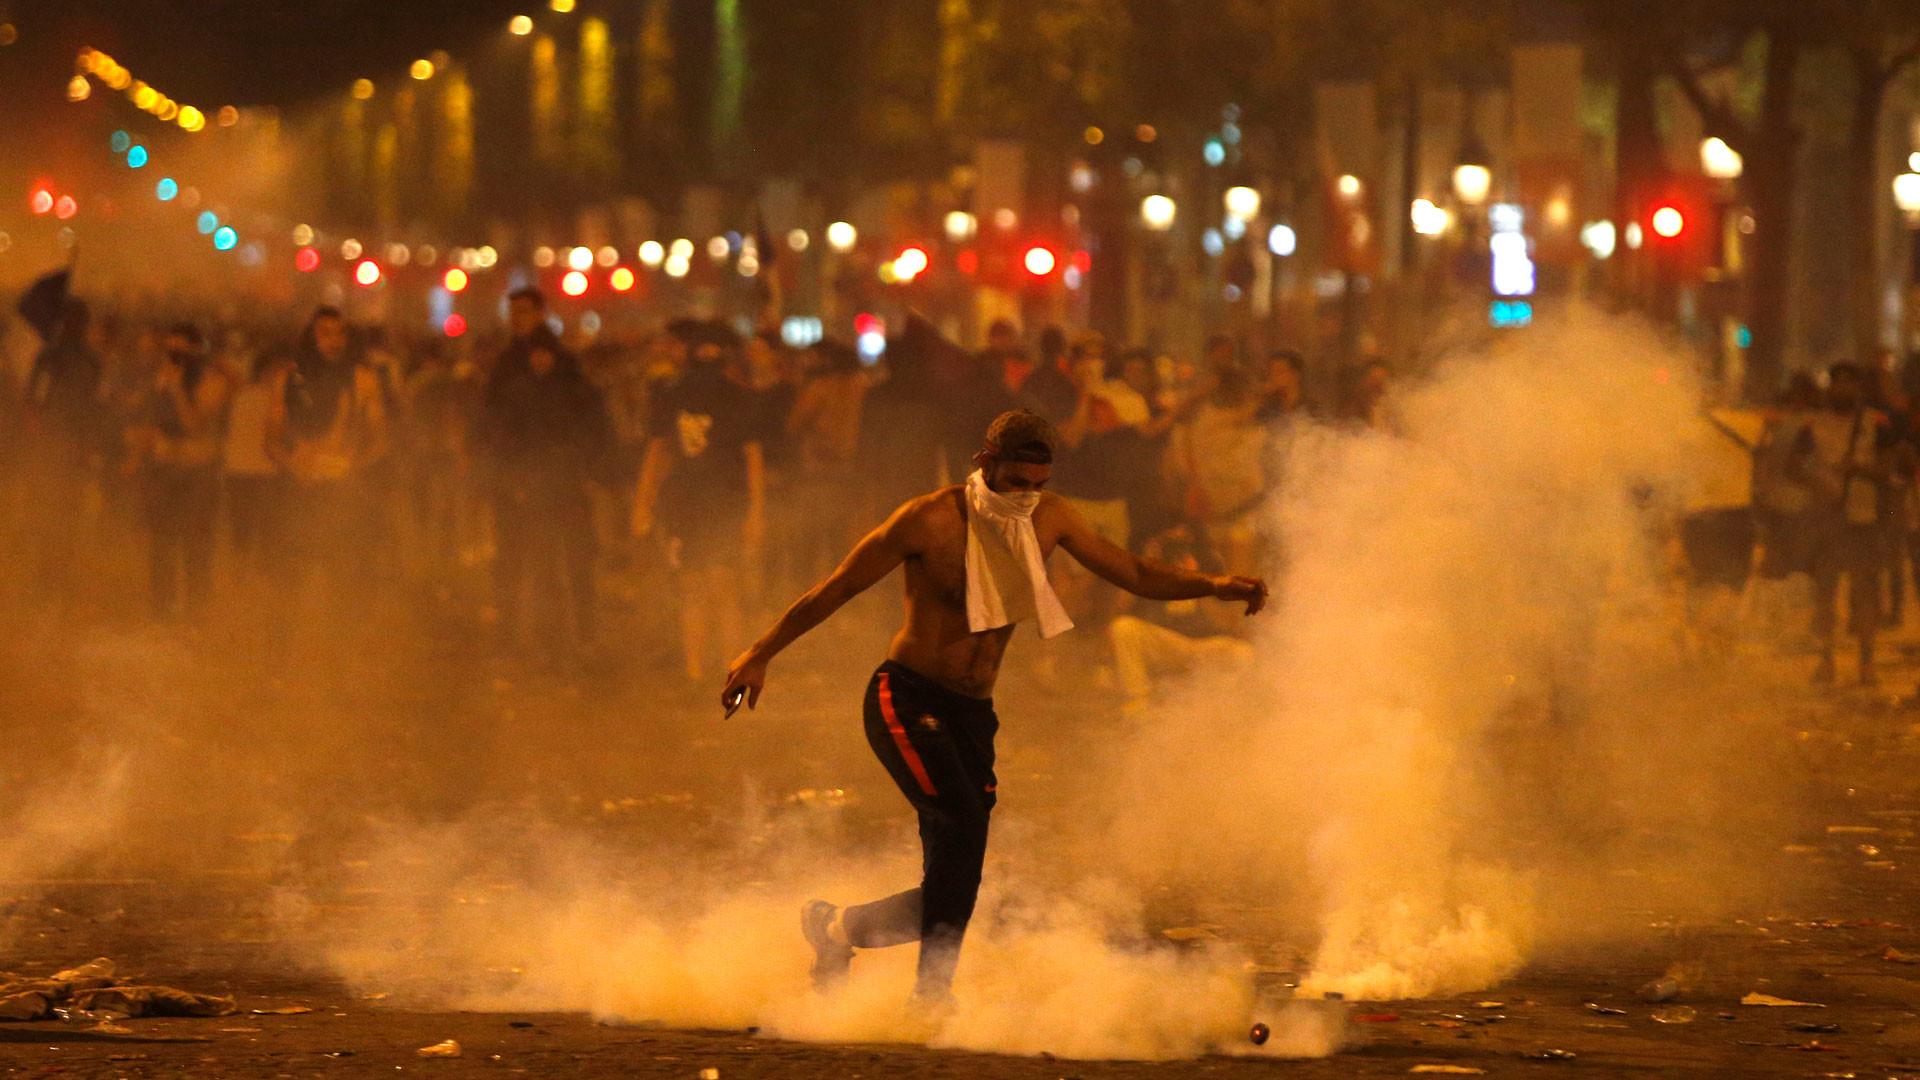 <p>Фото: &copy;&nbsp;<span>AP Photo / Thibault Camus</span></p>